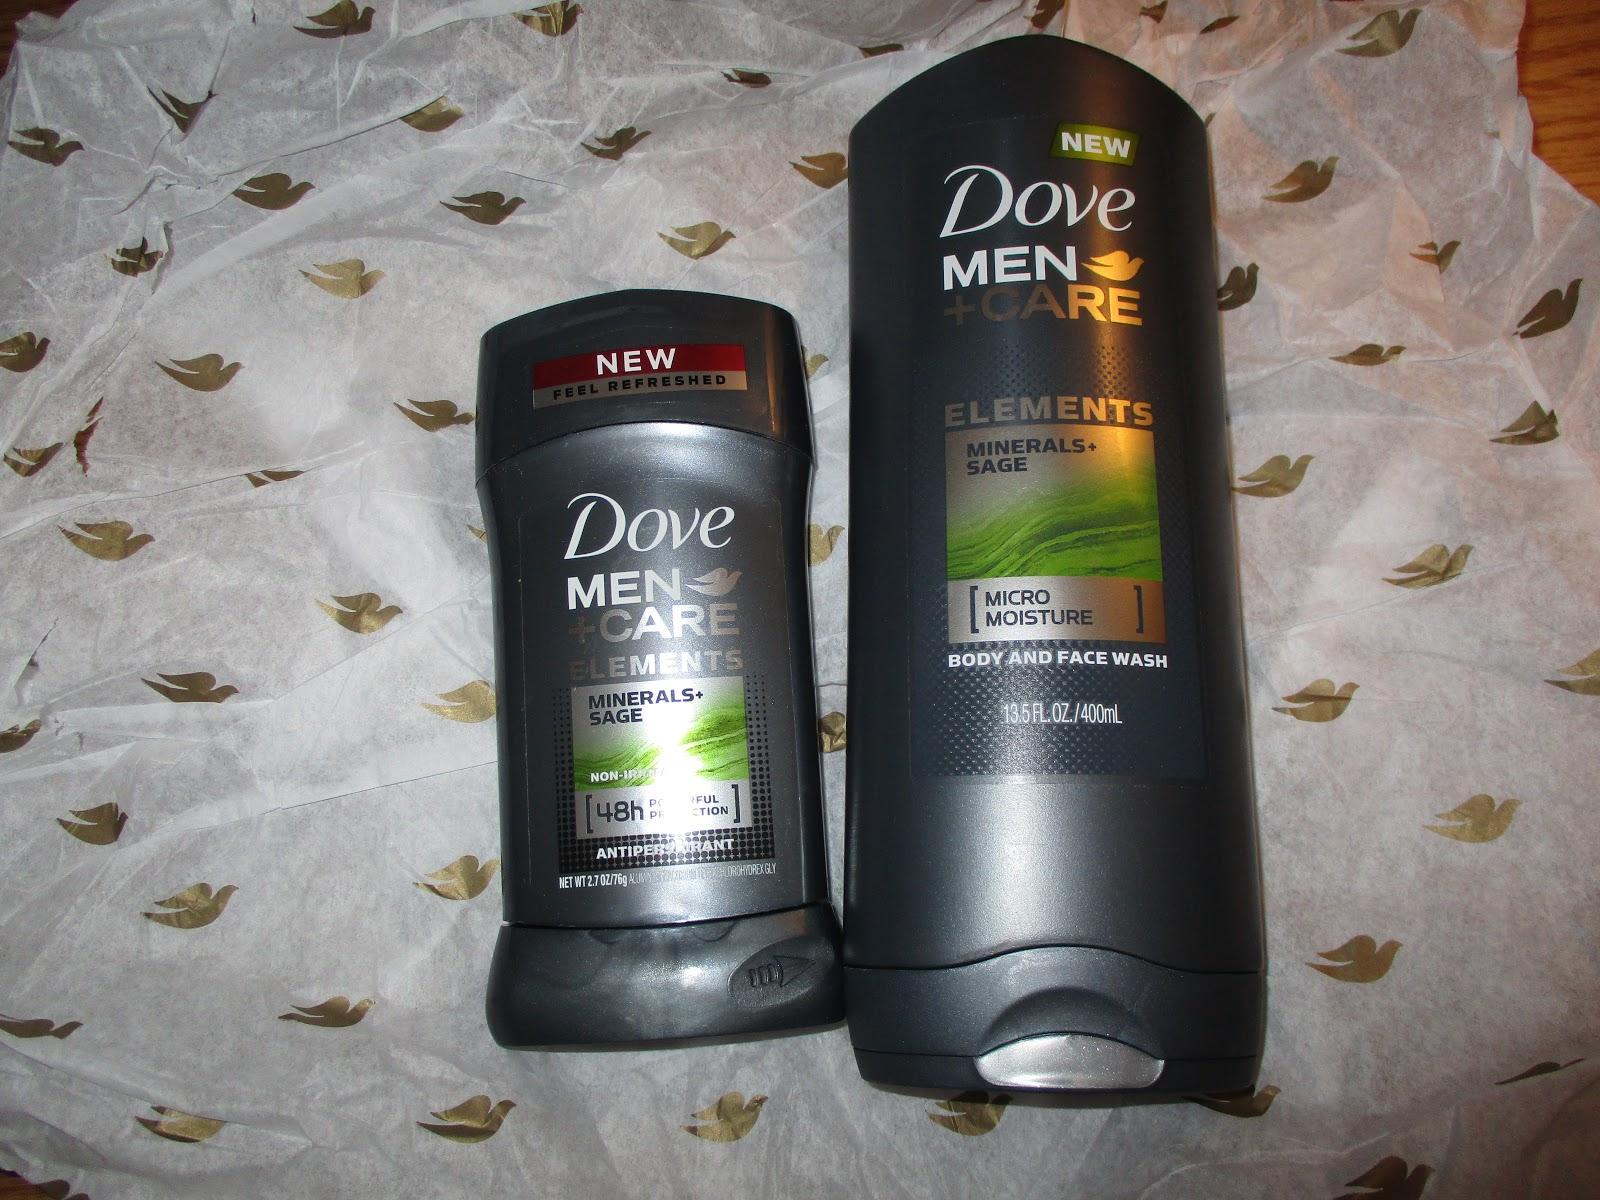 Missys Product Reviews Dove Men Care Elements Mineral Sage